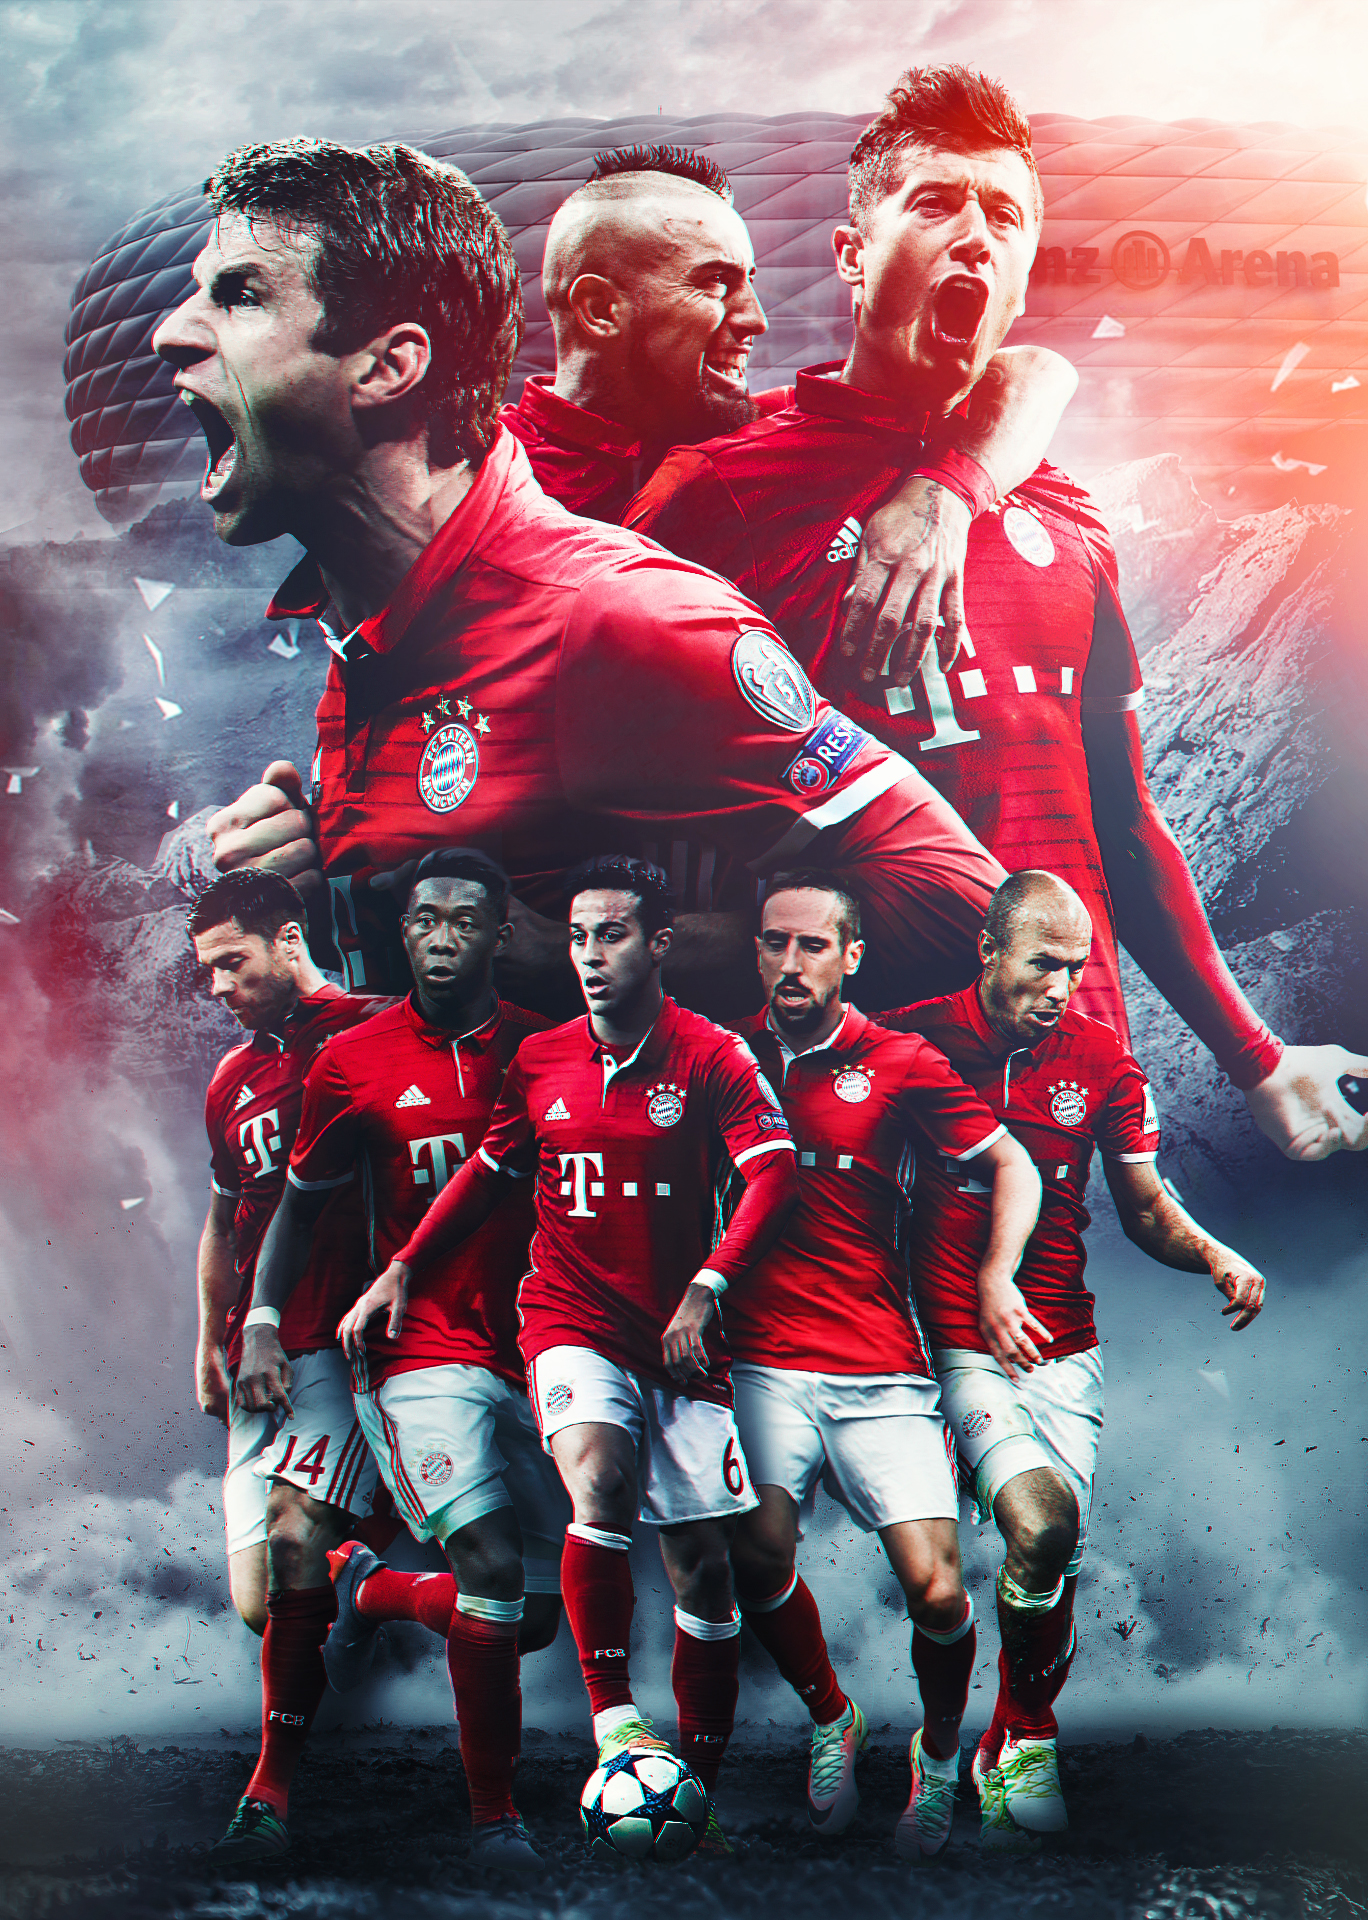 Bayern Munich Hd Wallpaper By Kerimov23 On Deviantart